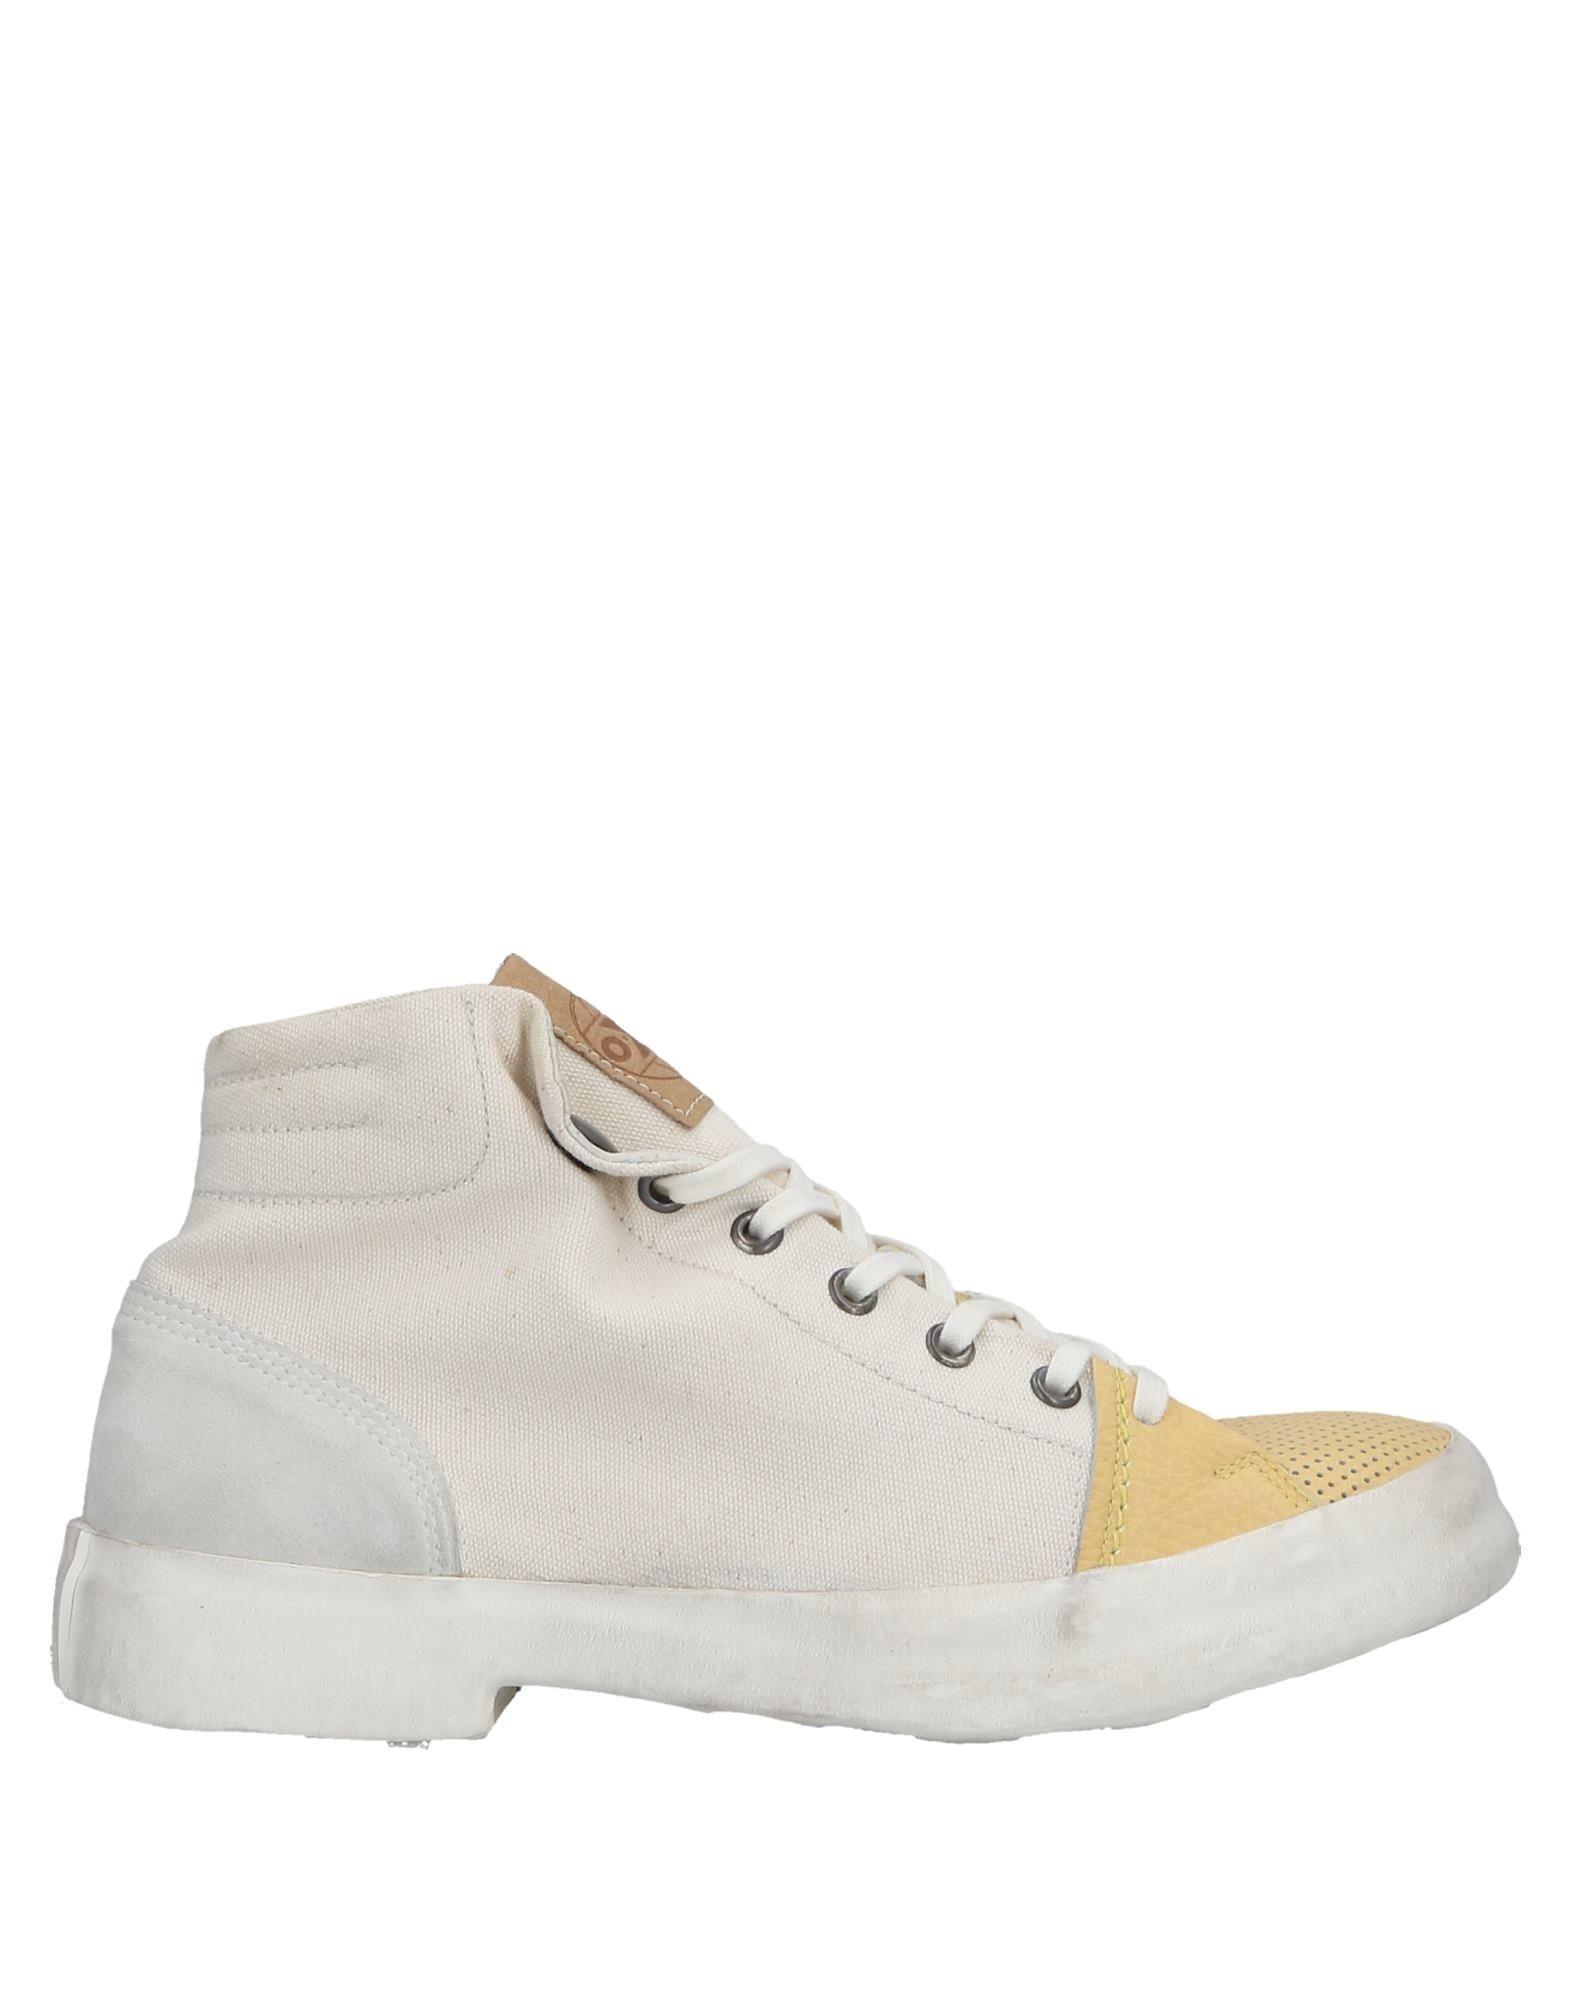 Moda Sneakers O.X.S. Donna - 11517848UJ